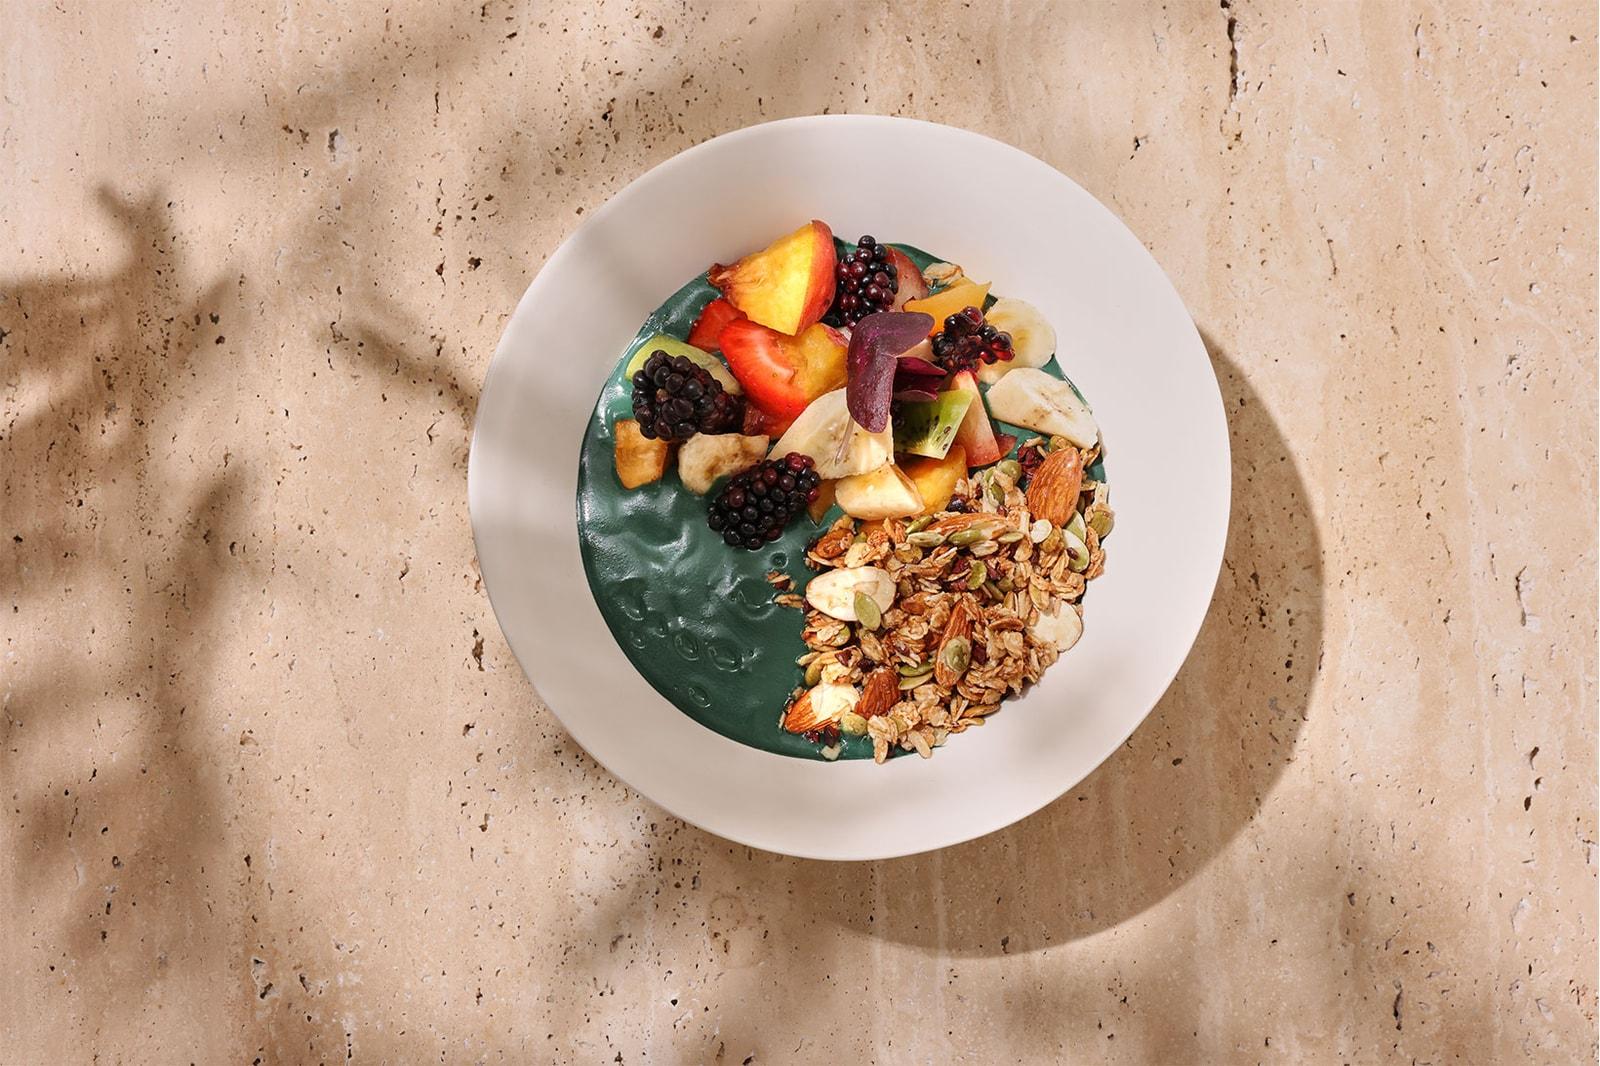 alo yoga sutra plant based vegan restaurants healthy rooftop new york nyc flatiron menu location address